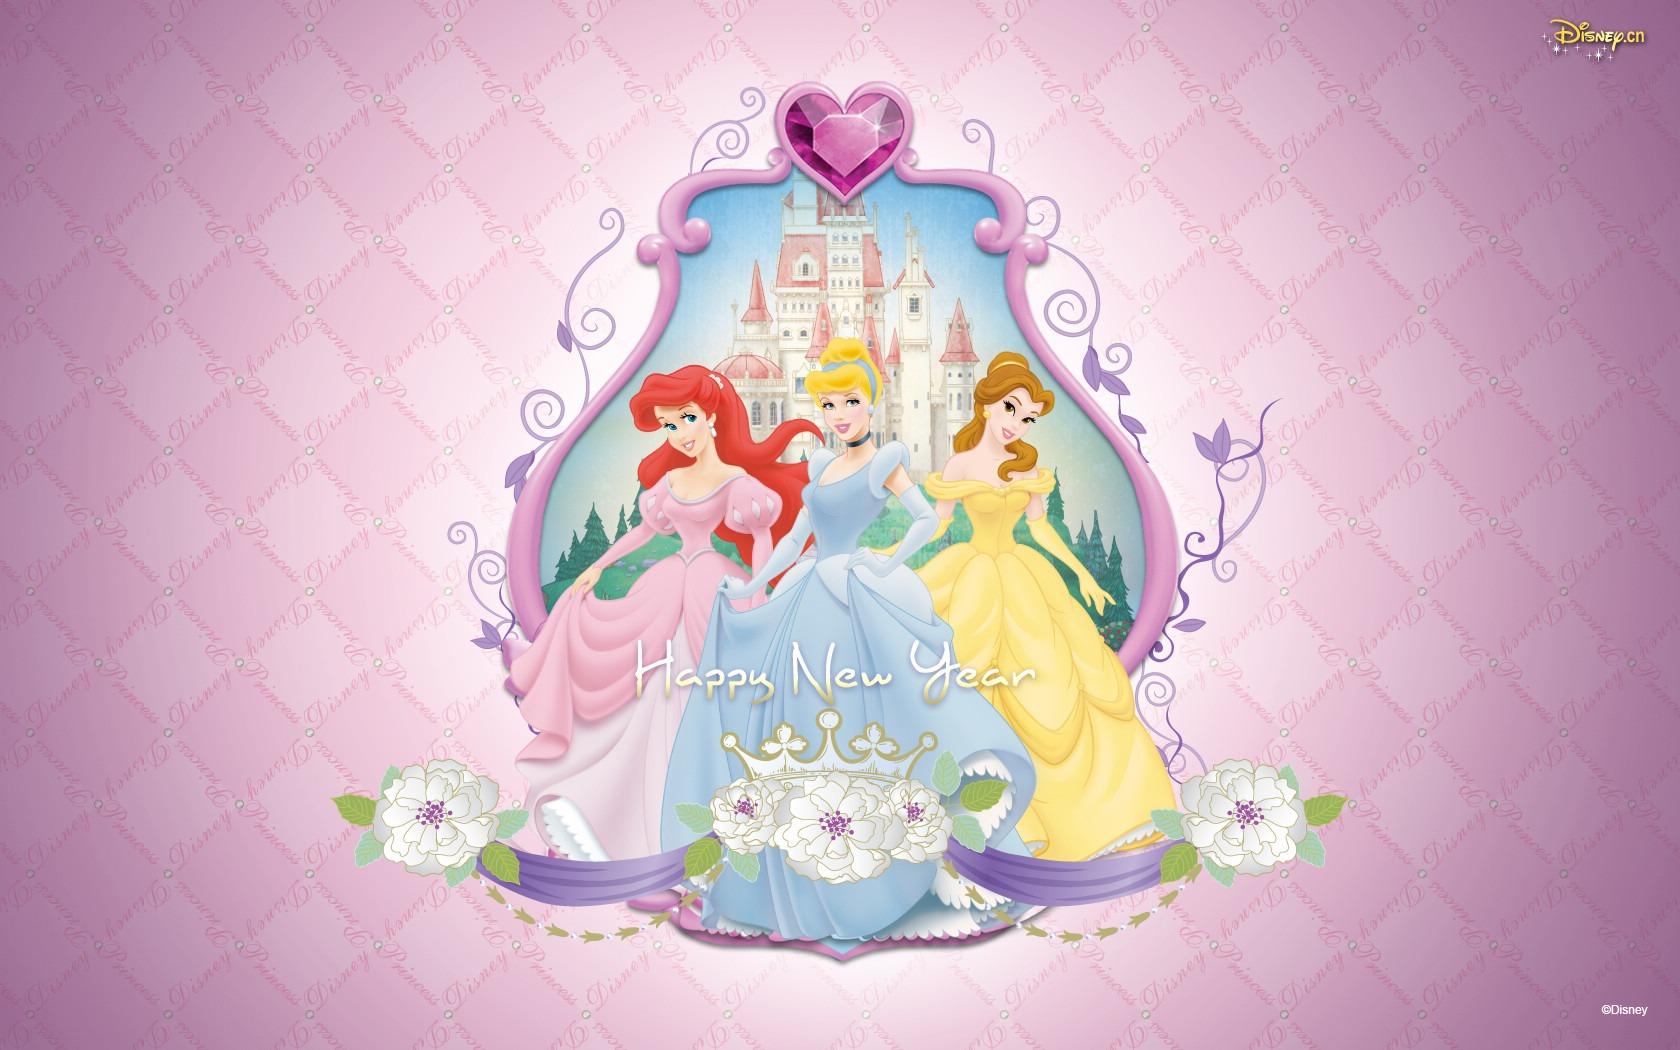 Disney Princess Castle Wallpaper Disneyprincesswallpaper8jpg 1680x1050